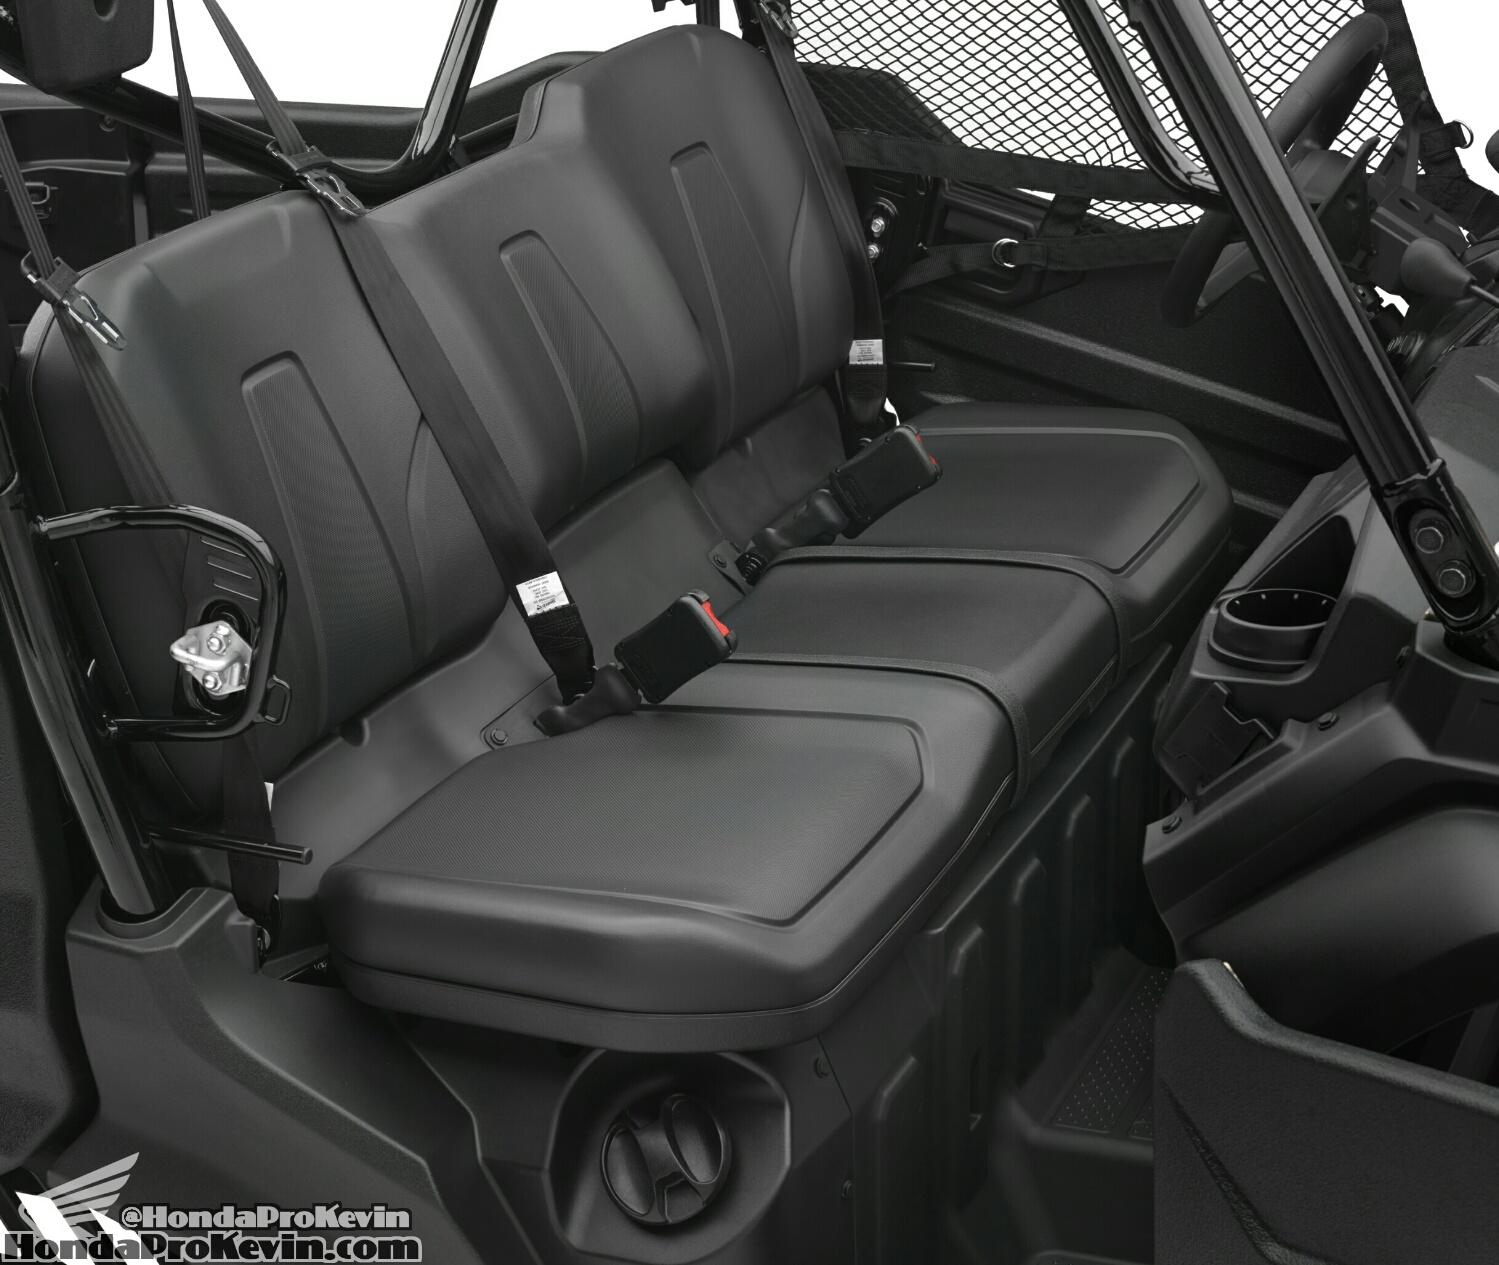 Honda Pioneer 700 >> 2016 Honda Pioneer 1000-5 SxS Engine / Frame / Suspension / Interior Pictures | Honda-Pro Kevin